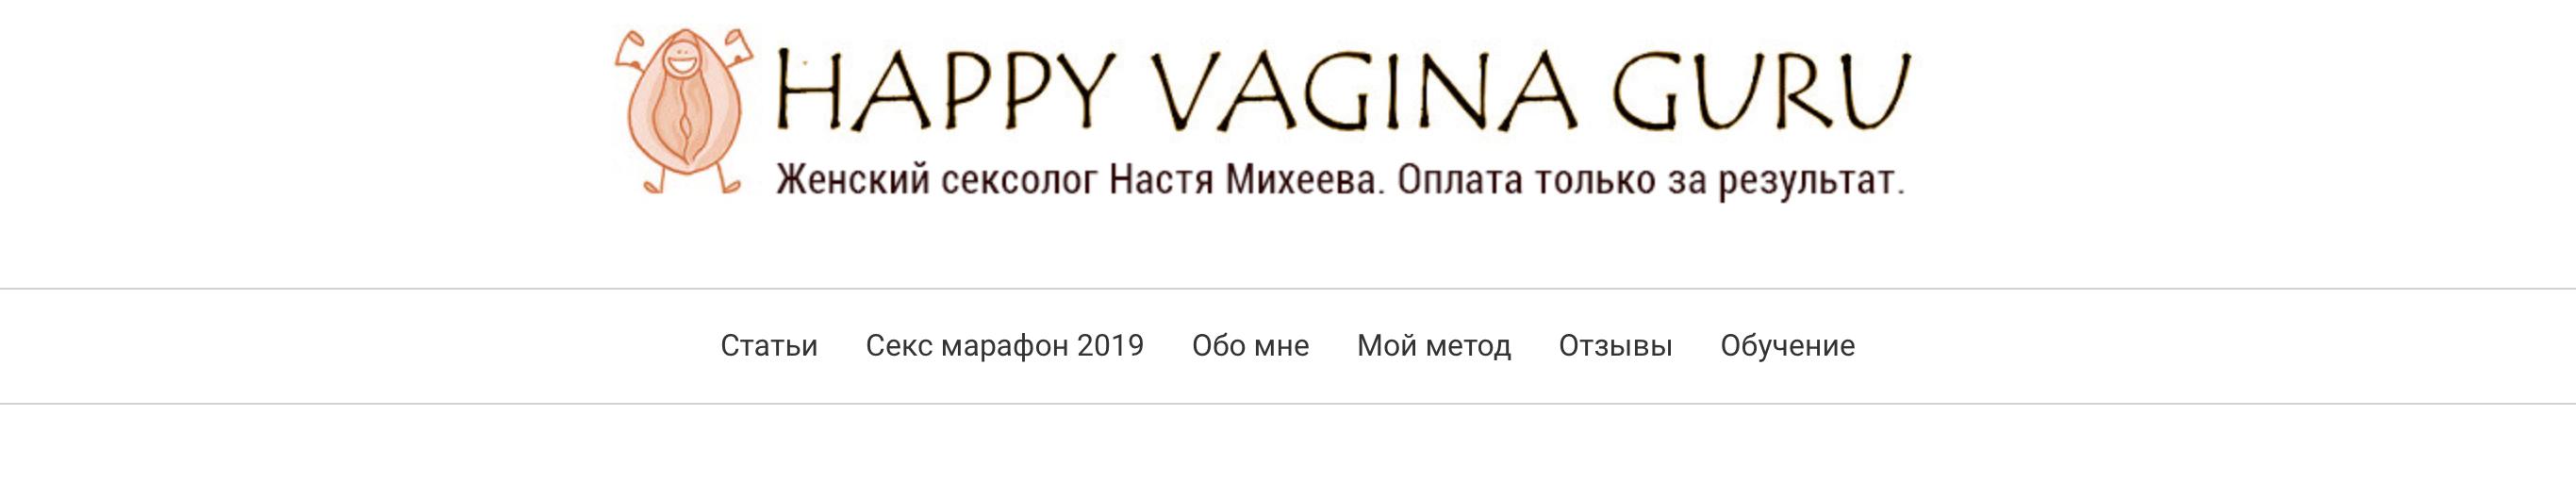 https://i2.imageban.ru/out/2019/06/10/7a56c2cd3901a76f7c26d45177740abb.jpg